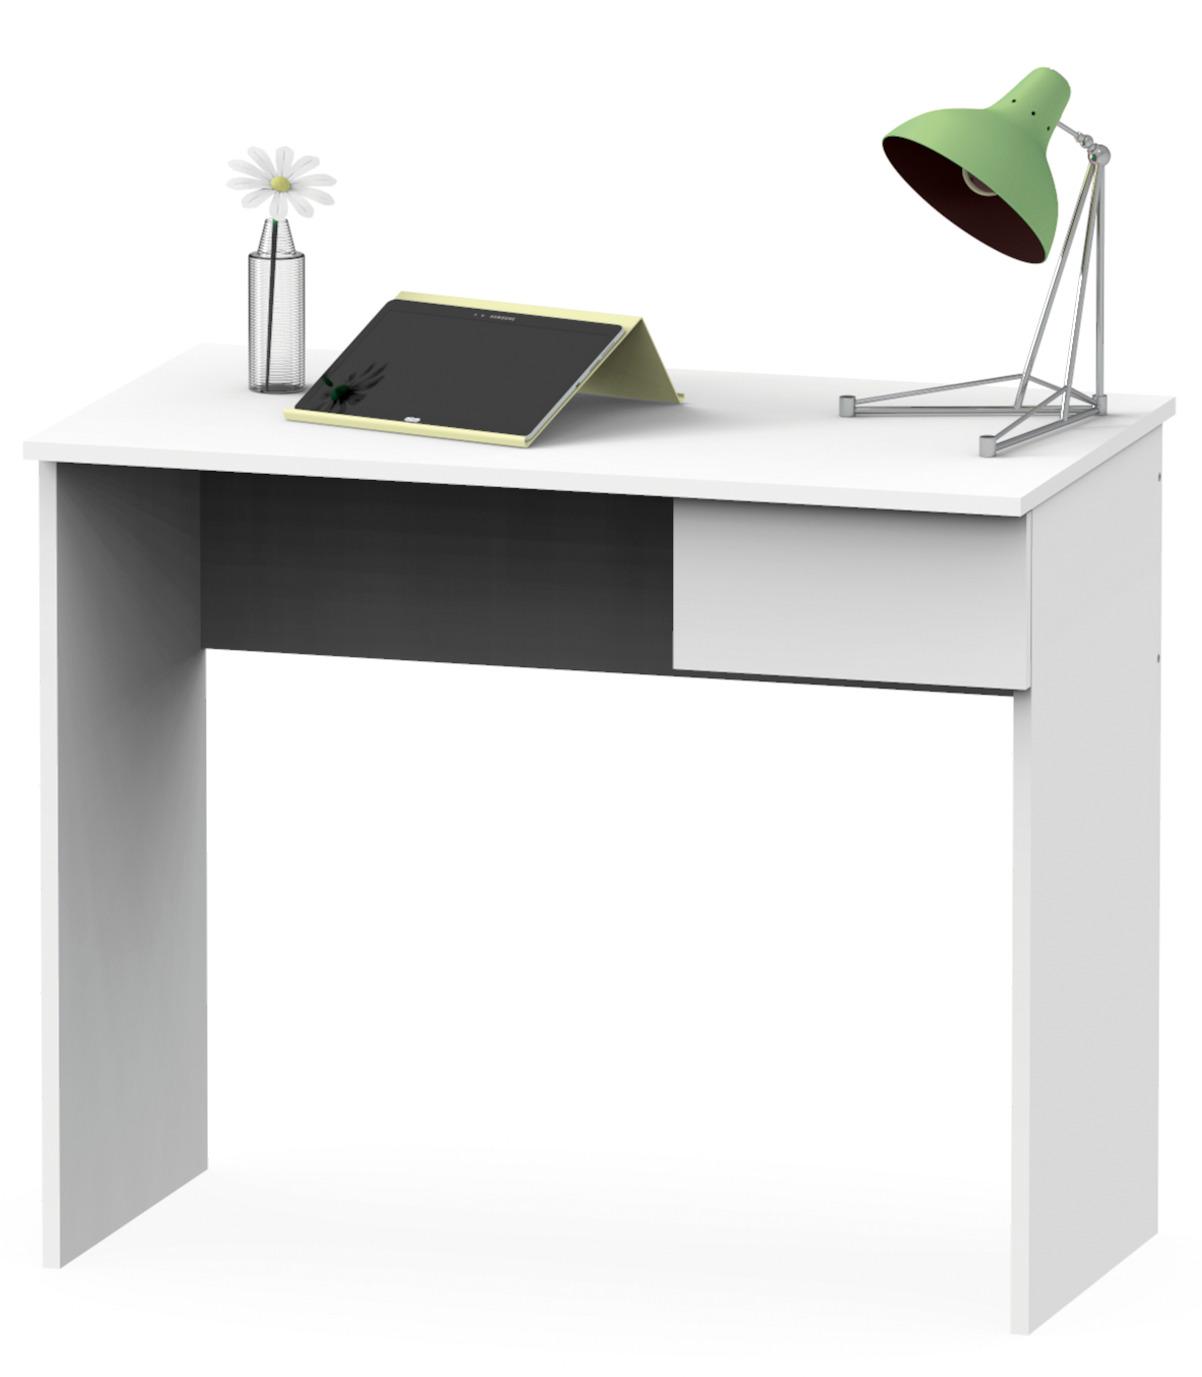 Mesa de ordenador escritorio juvenil con cajon color blanco mate estudio 90...